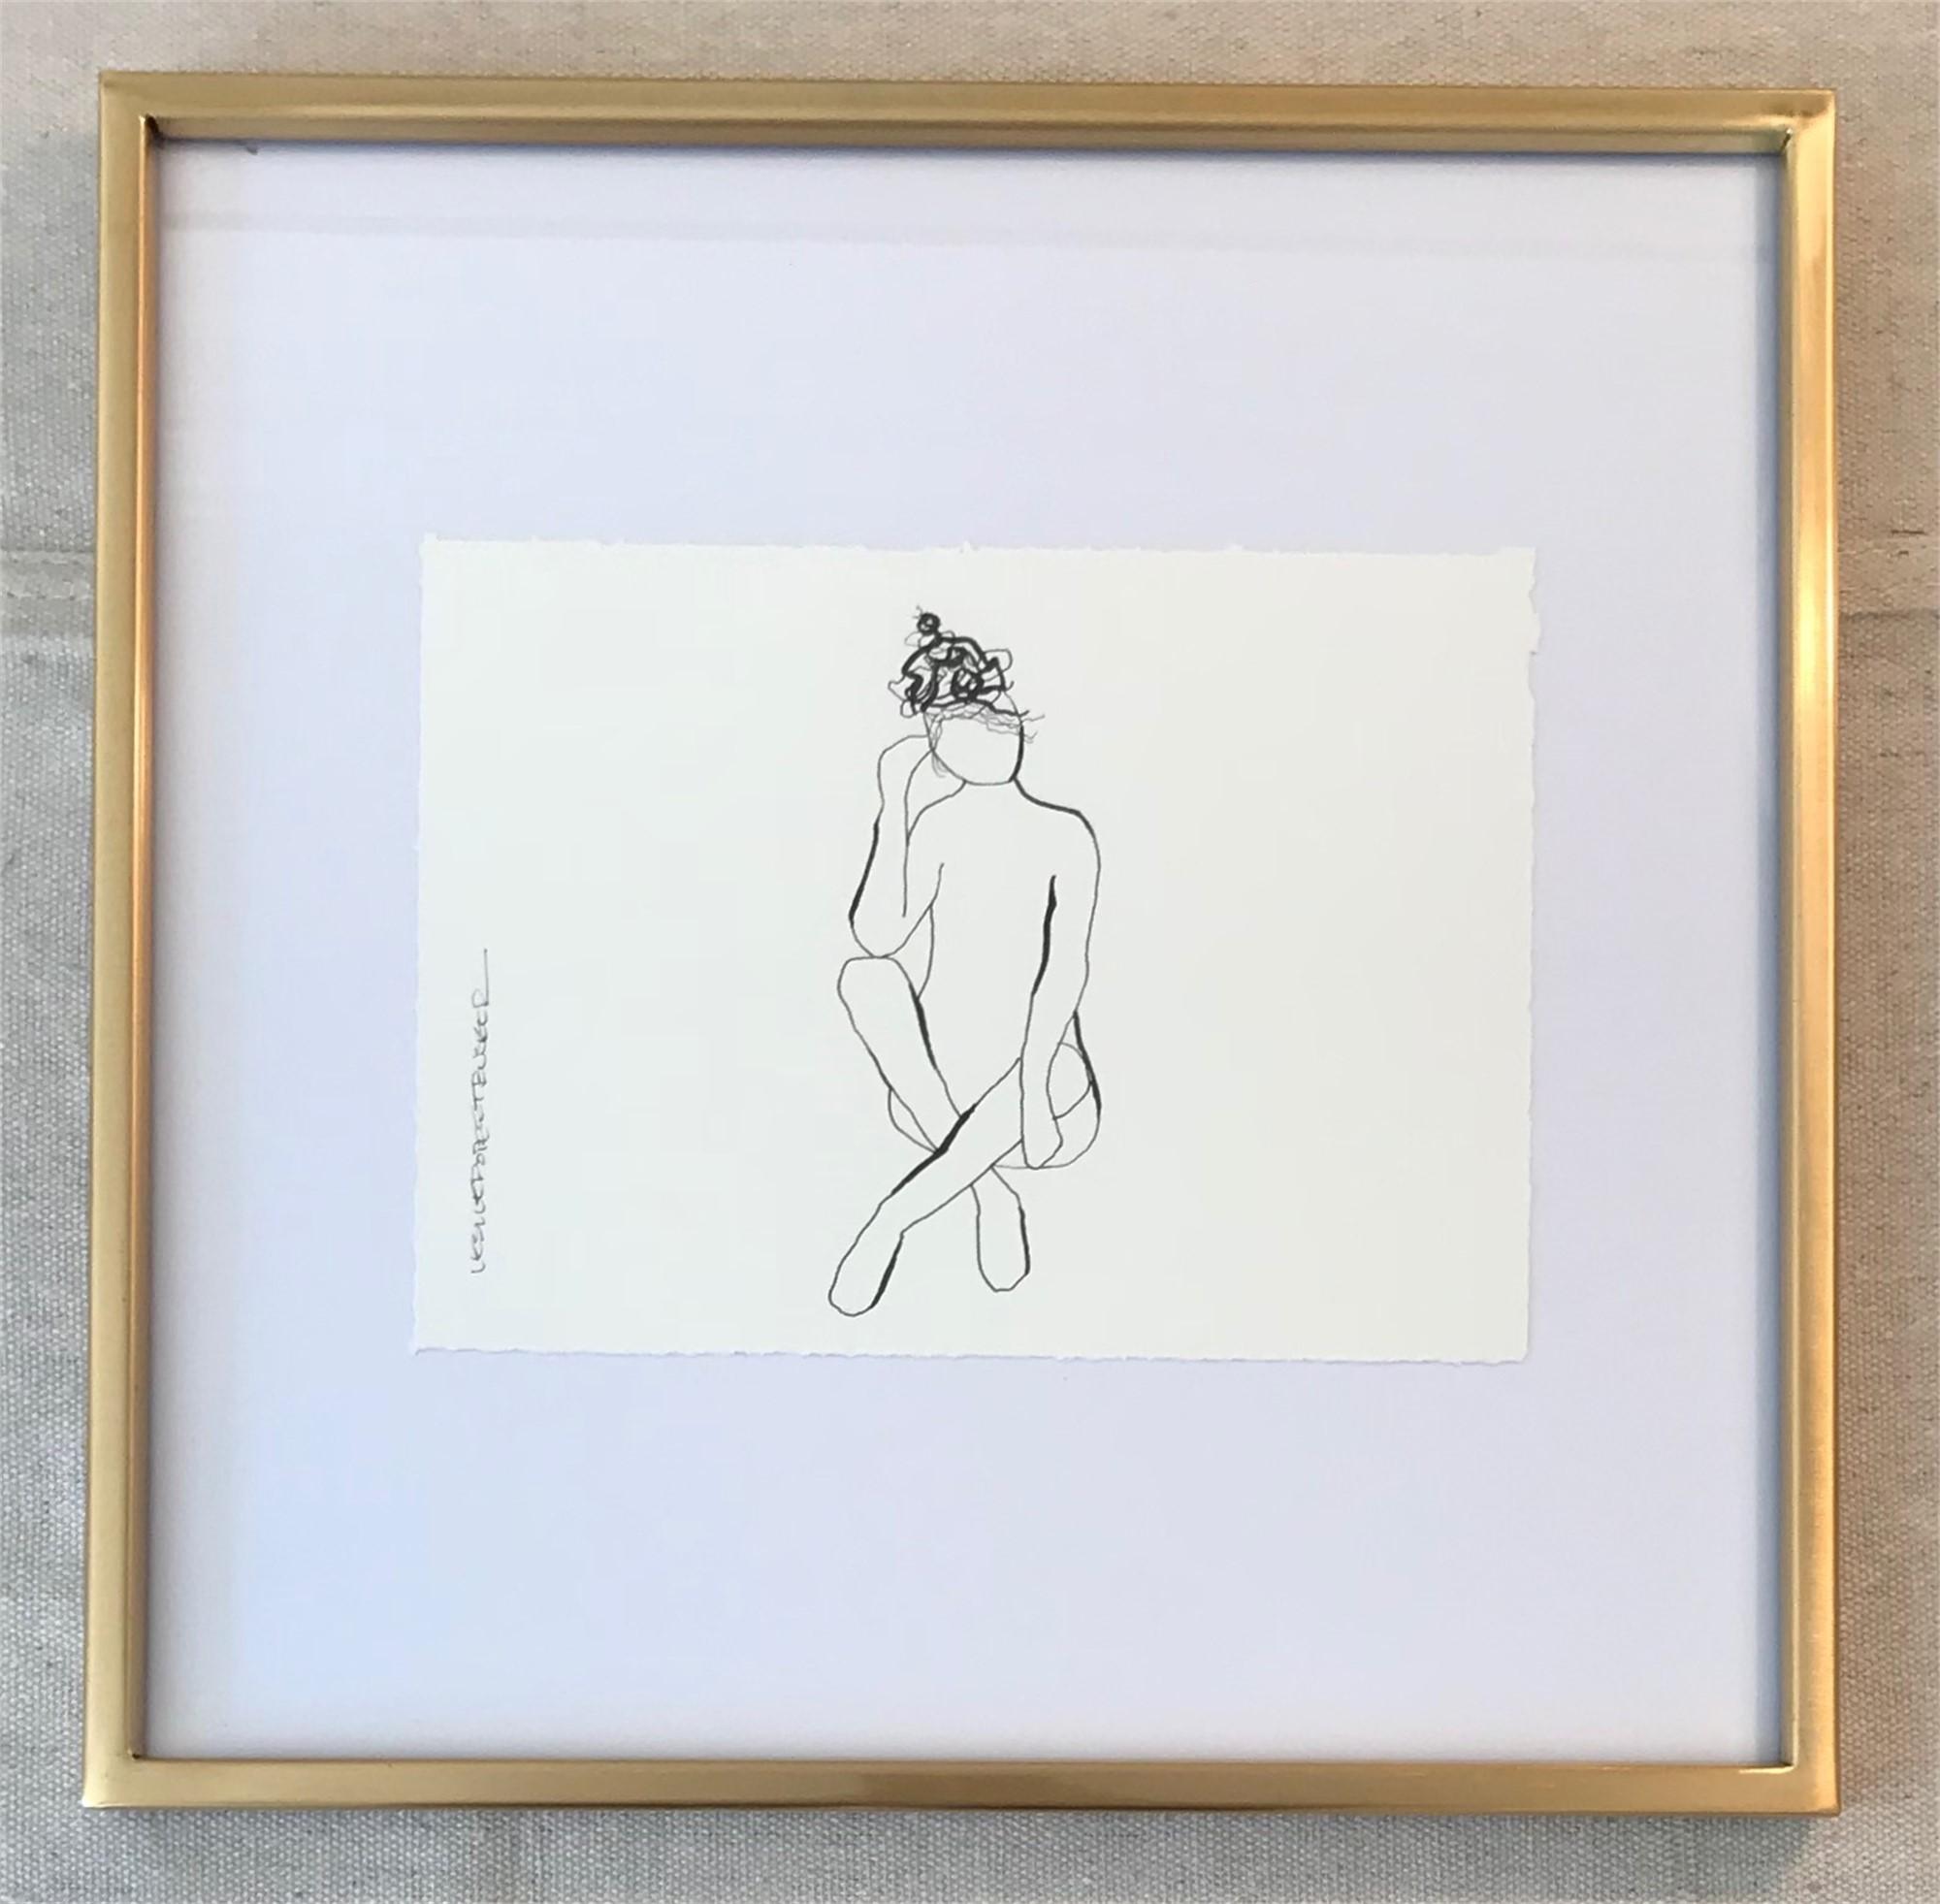 Figure No. 38 by Leslie Poteet Busker